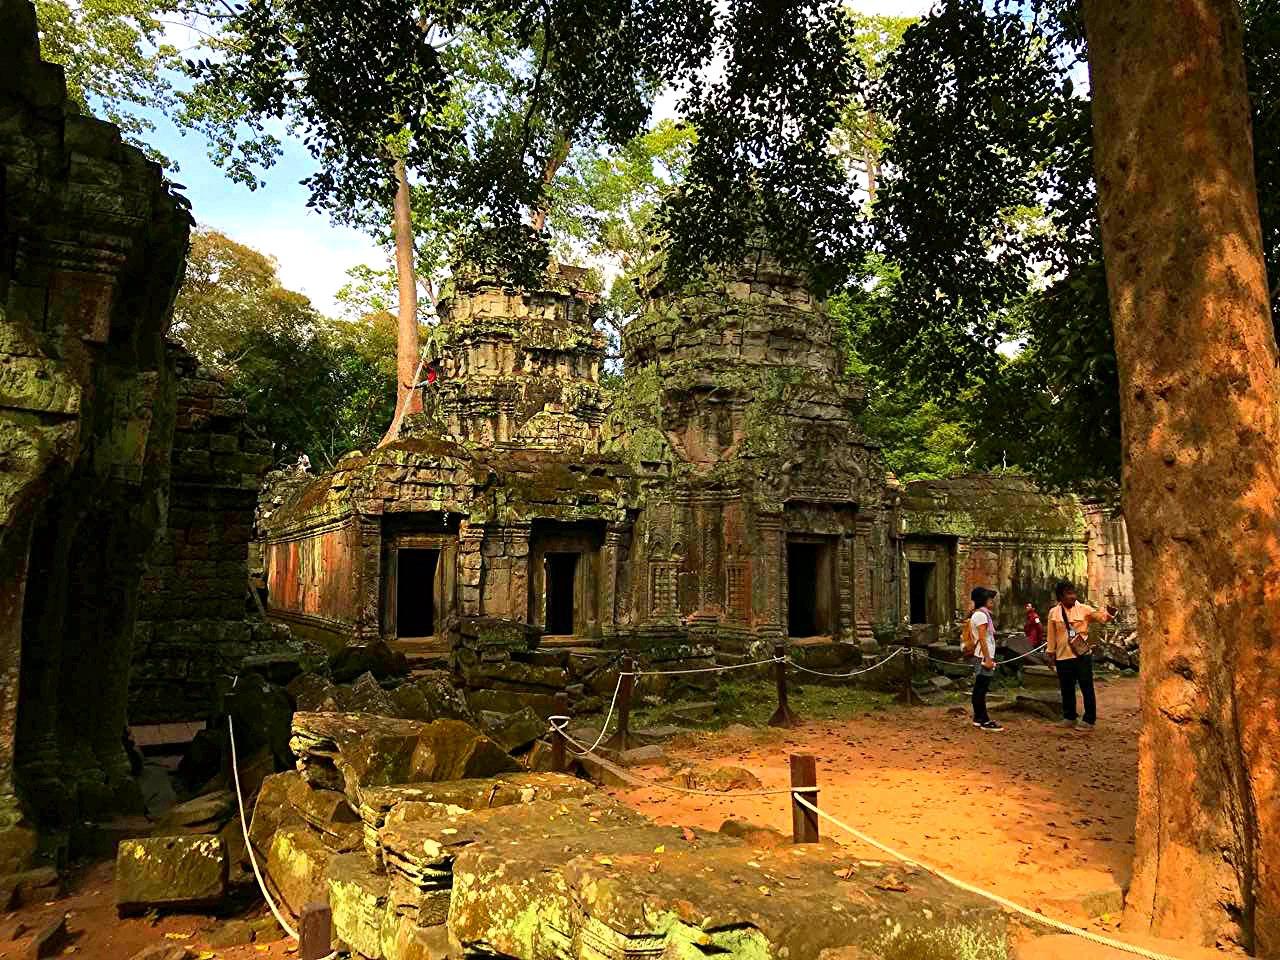 Елена Руденко (Валтея). Камбоджа. Ангкор. EOk5BVkYY8Q